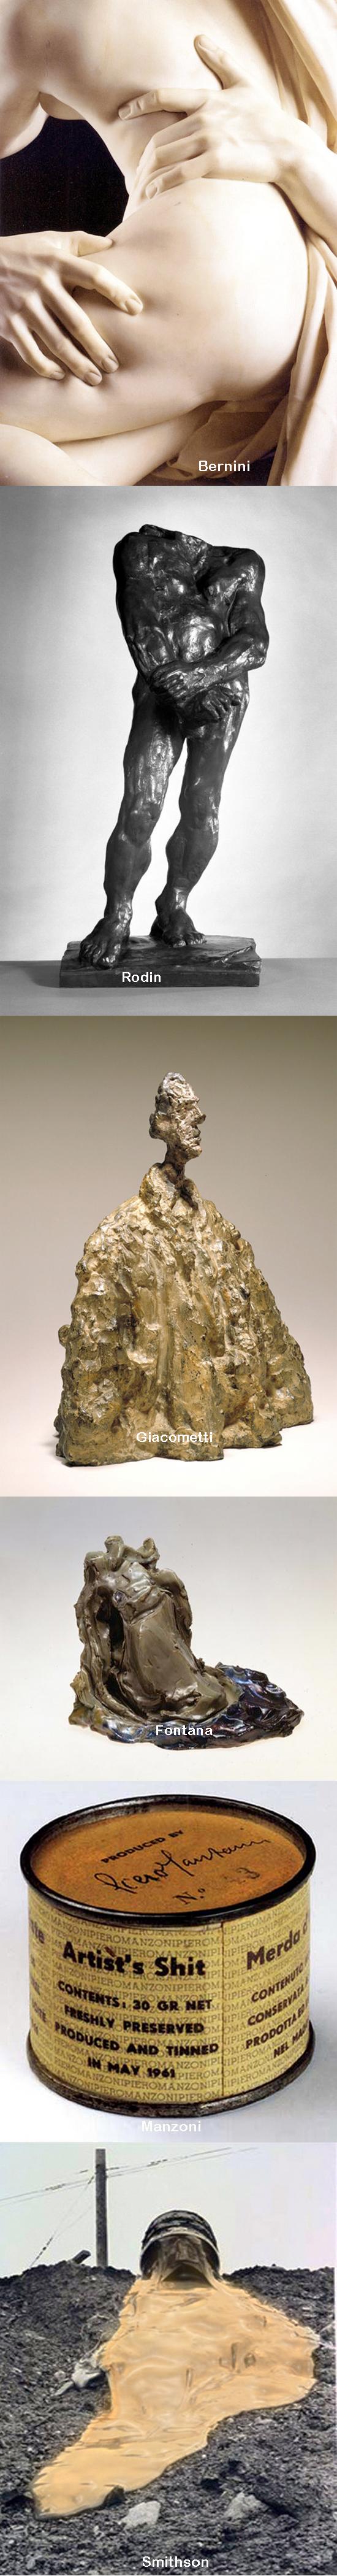 Sculptural Desublimation